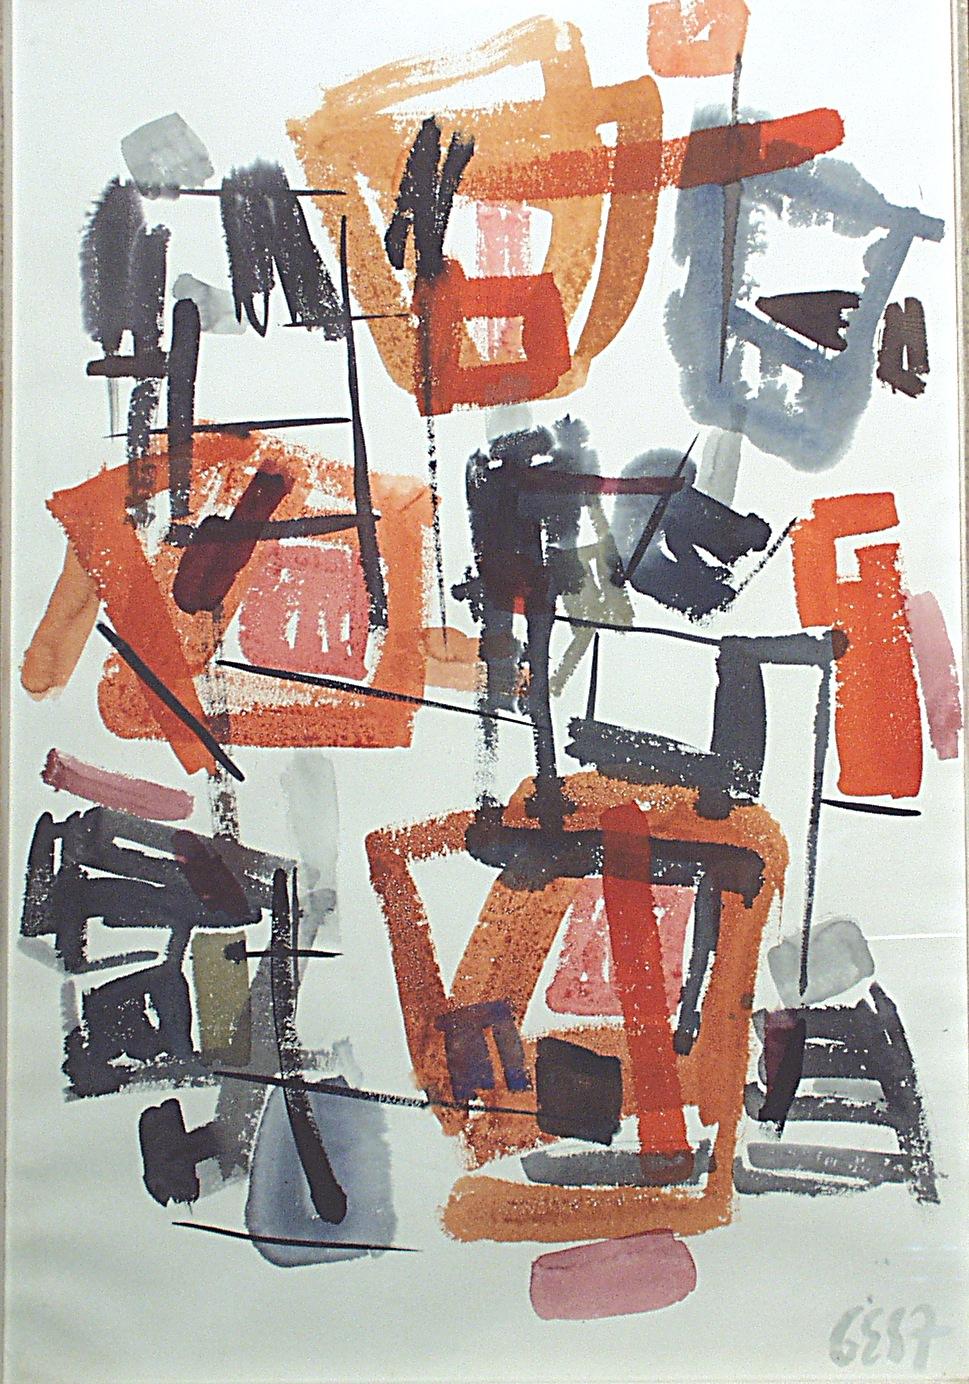 Calypso by Gerda Elisabeth Firant